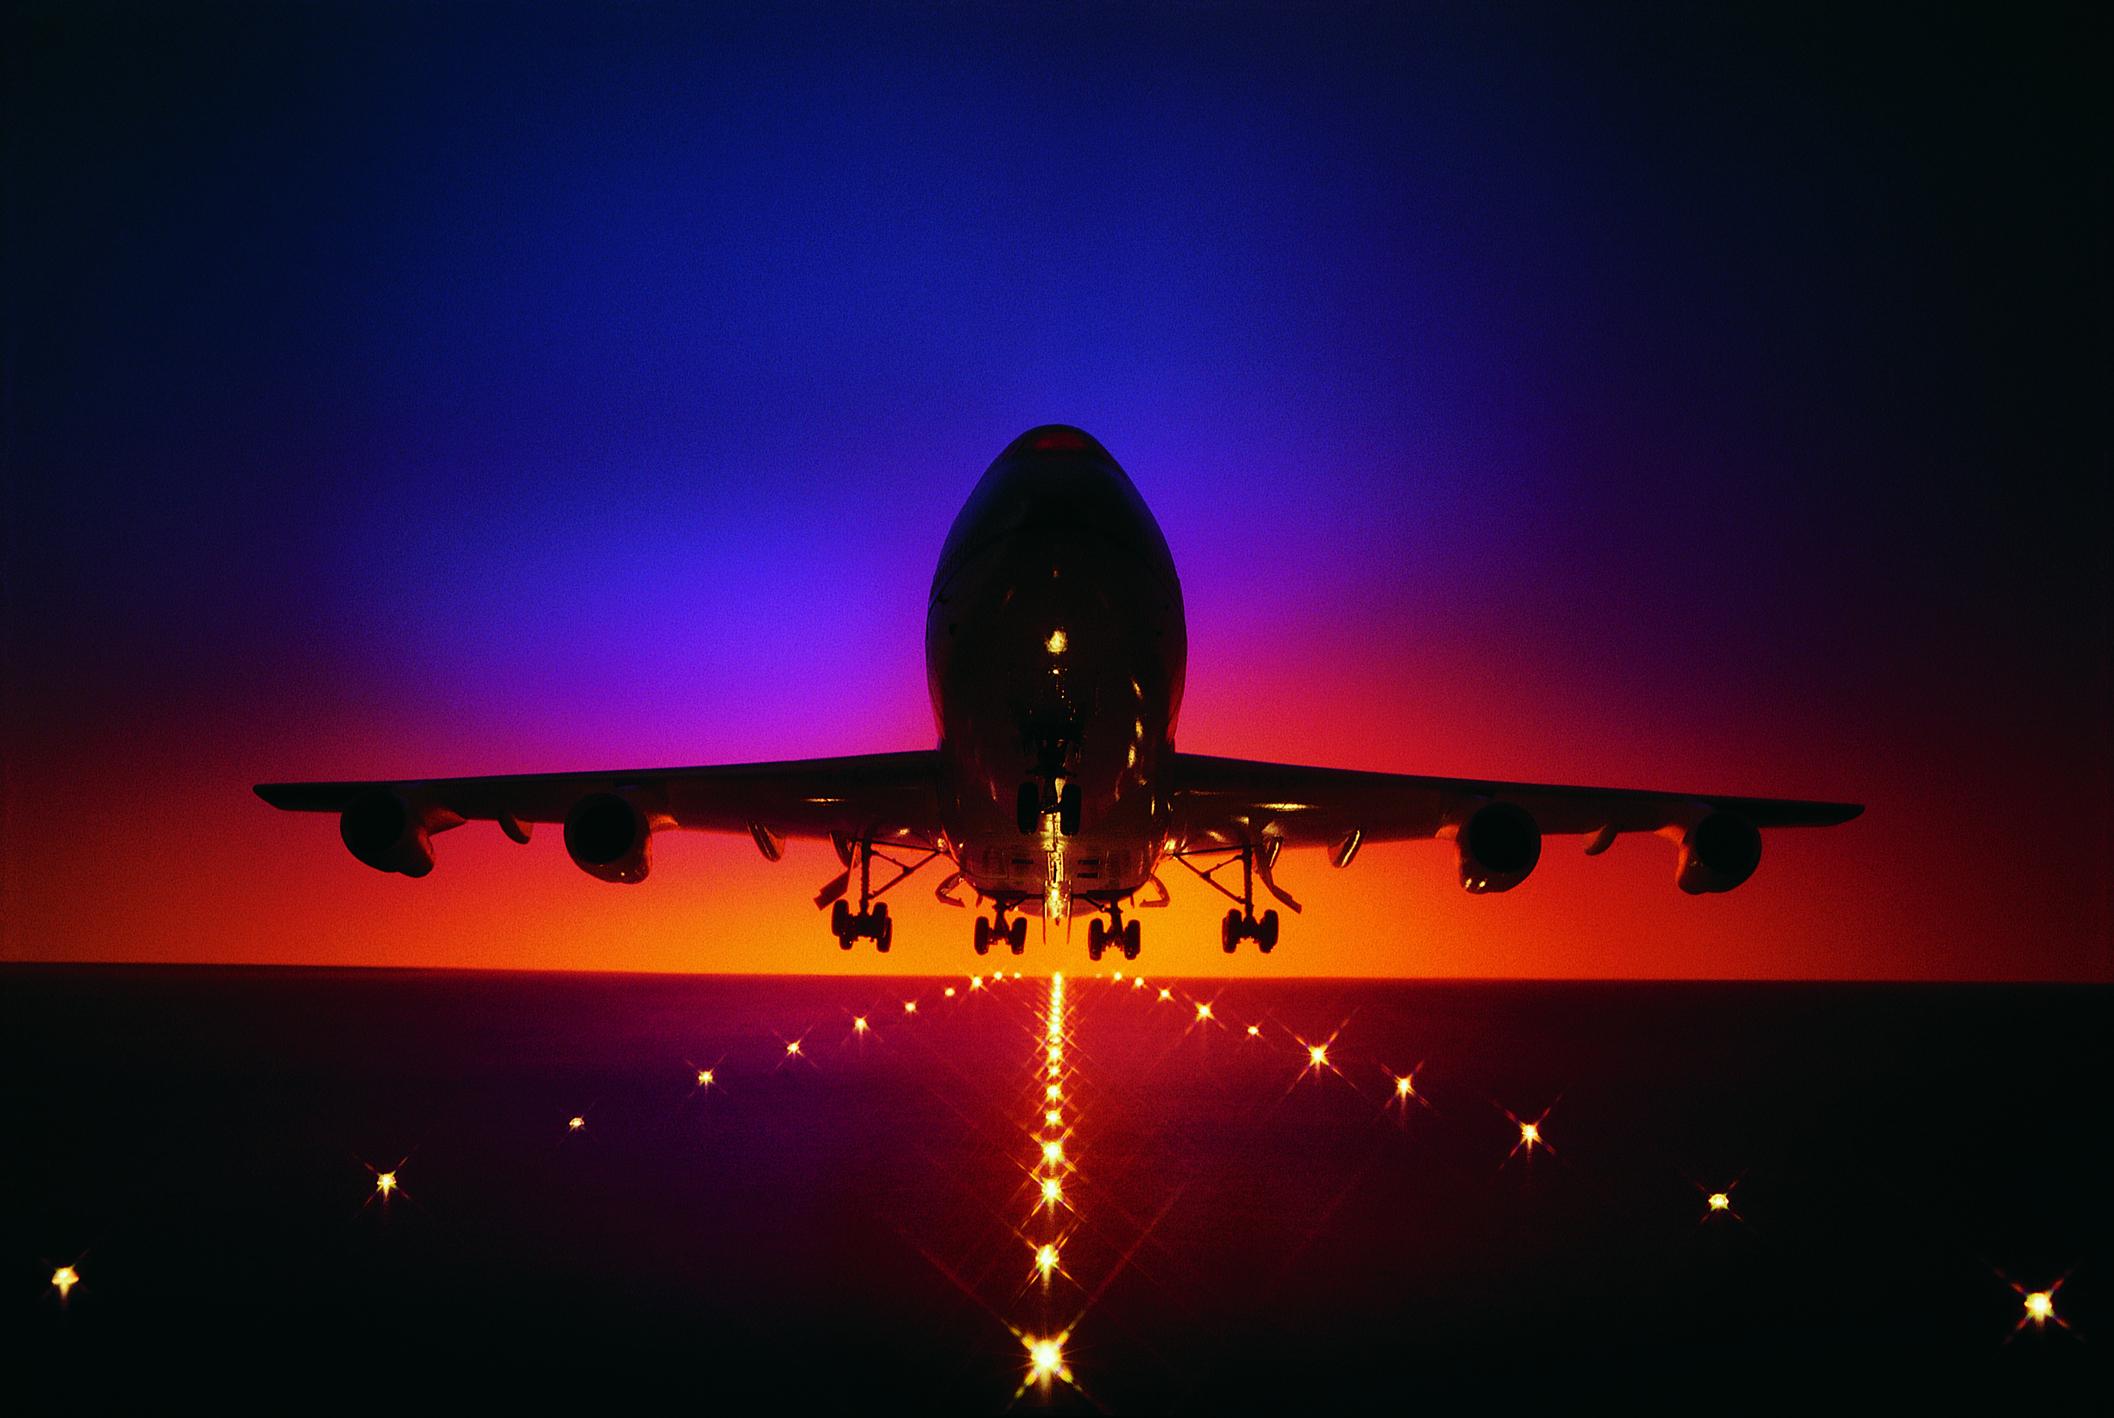 Plane taking off at dusk.